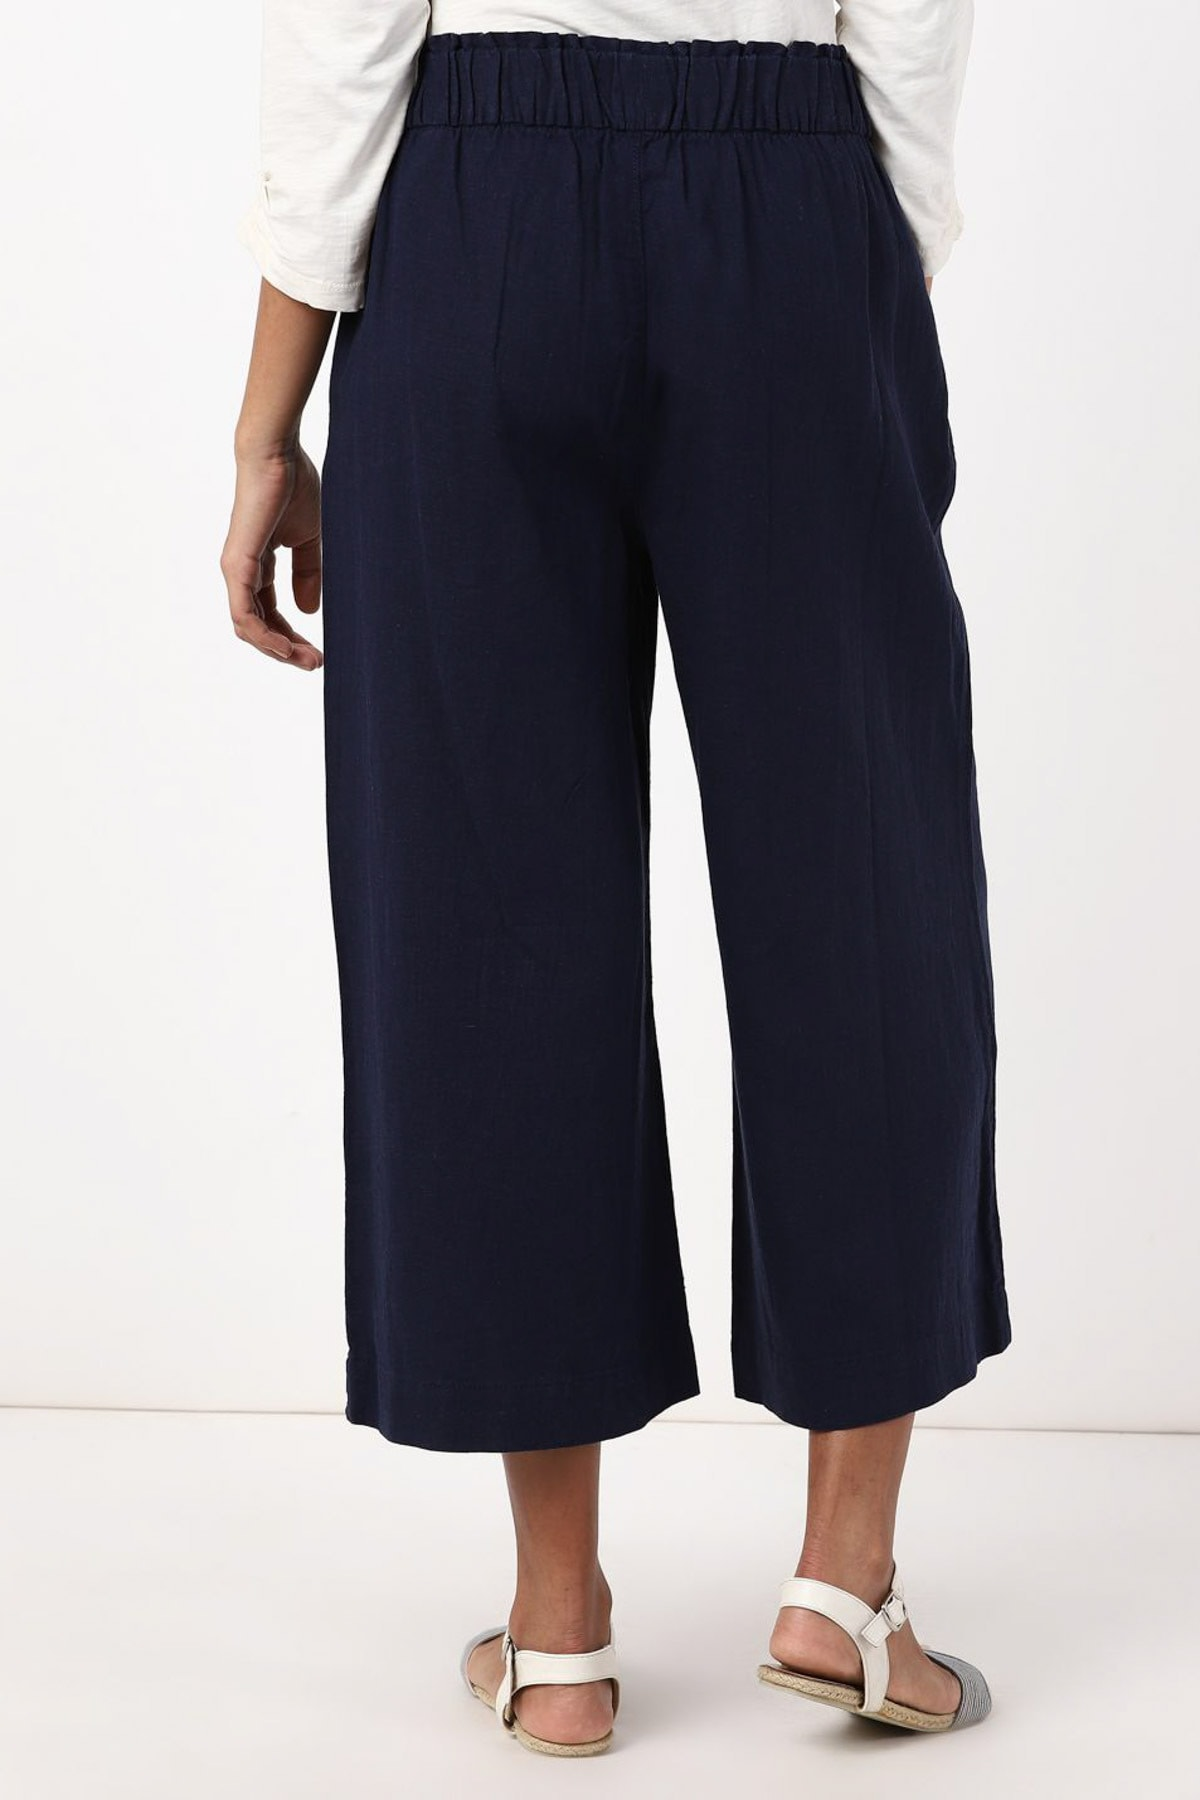 Marks & Spencer Kadın Lacivert Wide Leg Crop Pantolon T57007128X 2